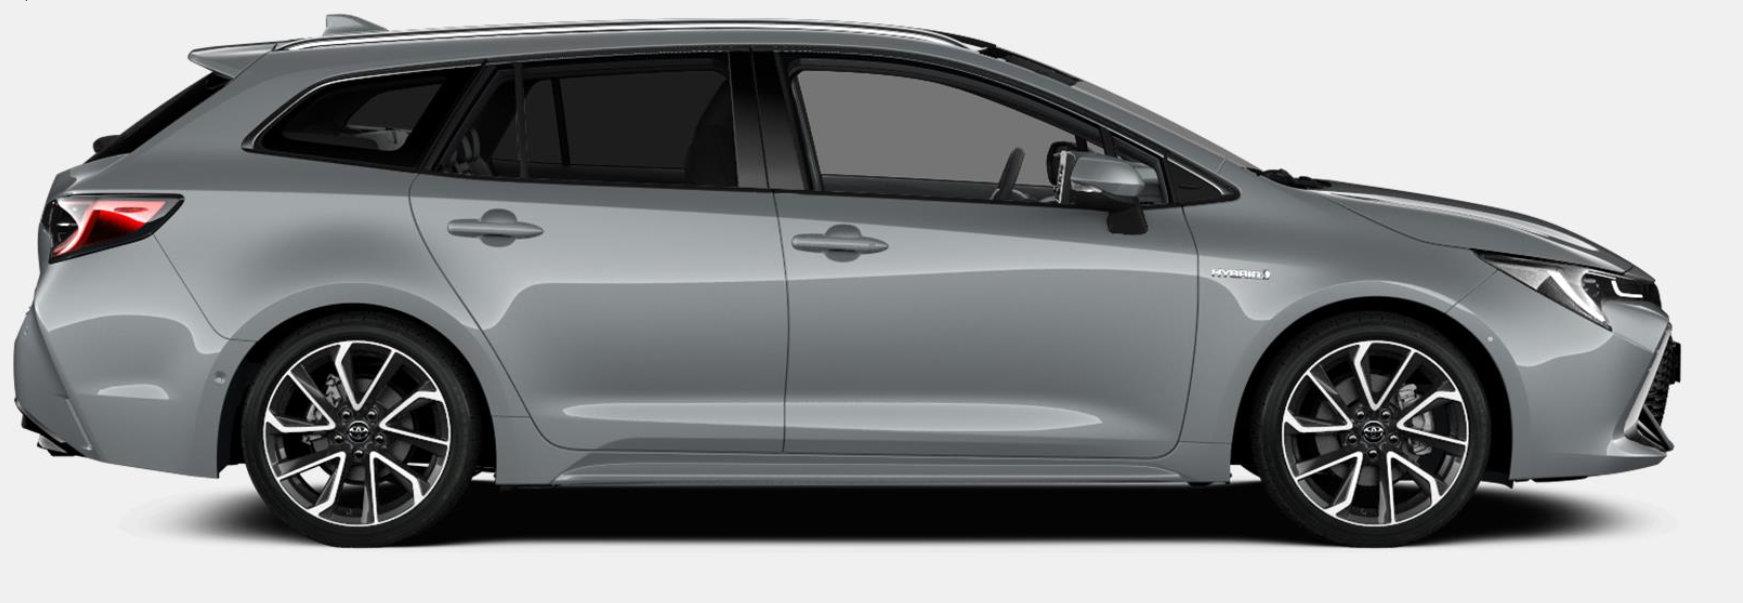 Toyota-Corolla-Touring-Sports-leasen-2